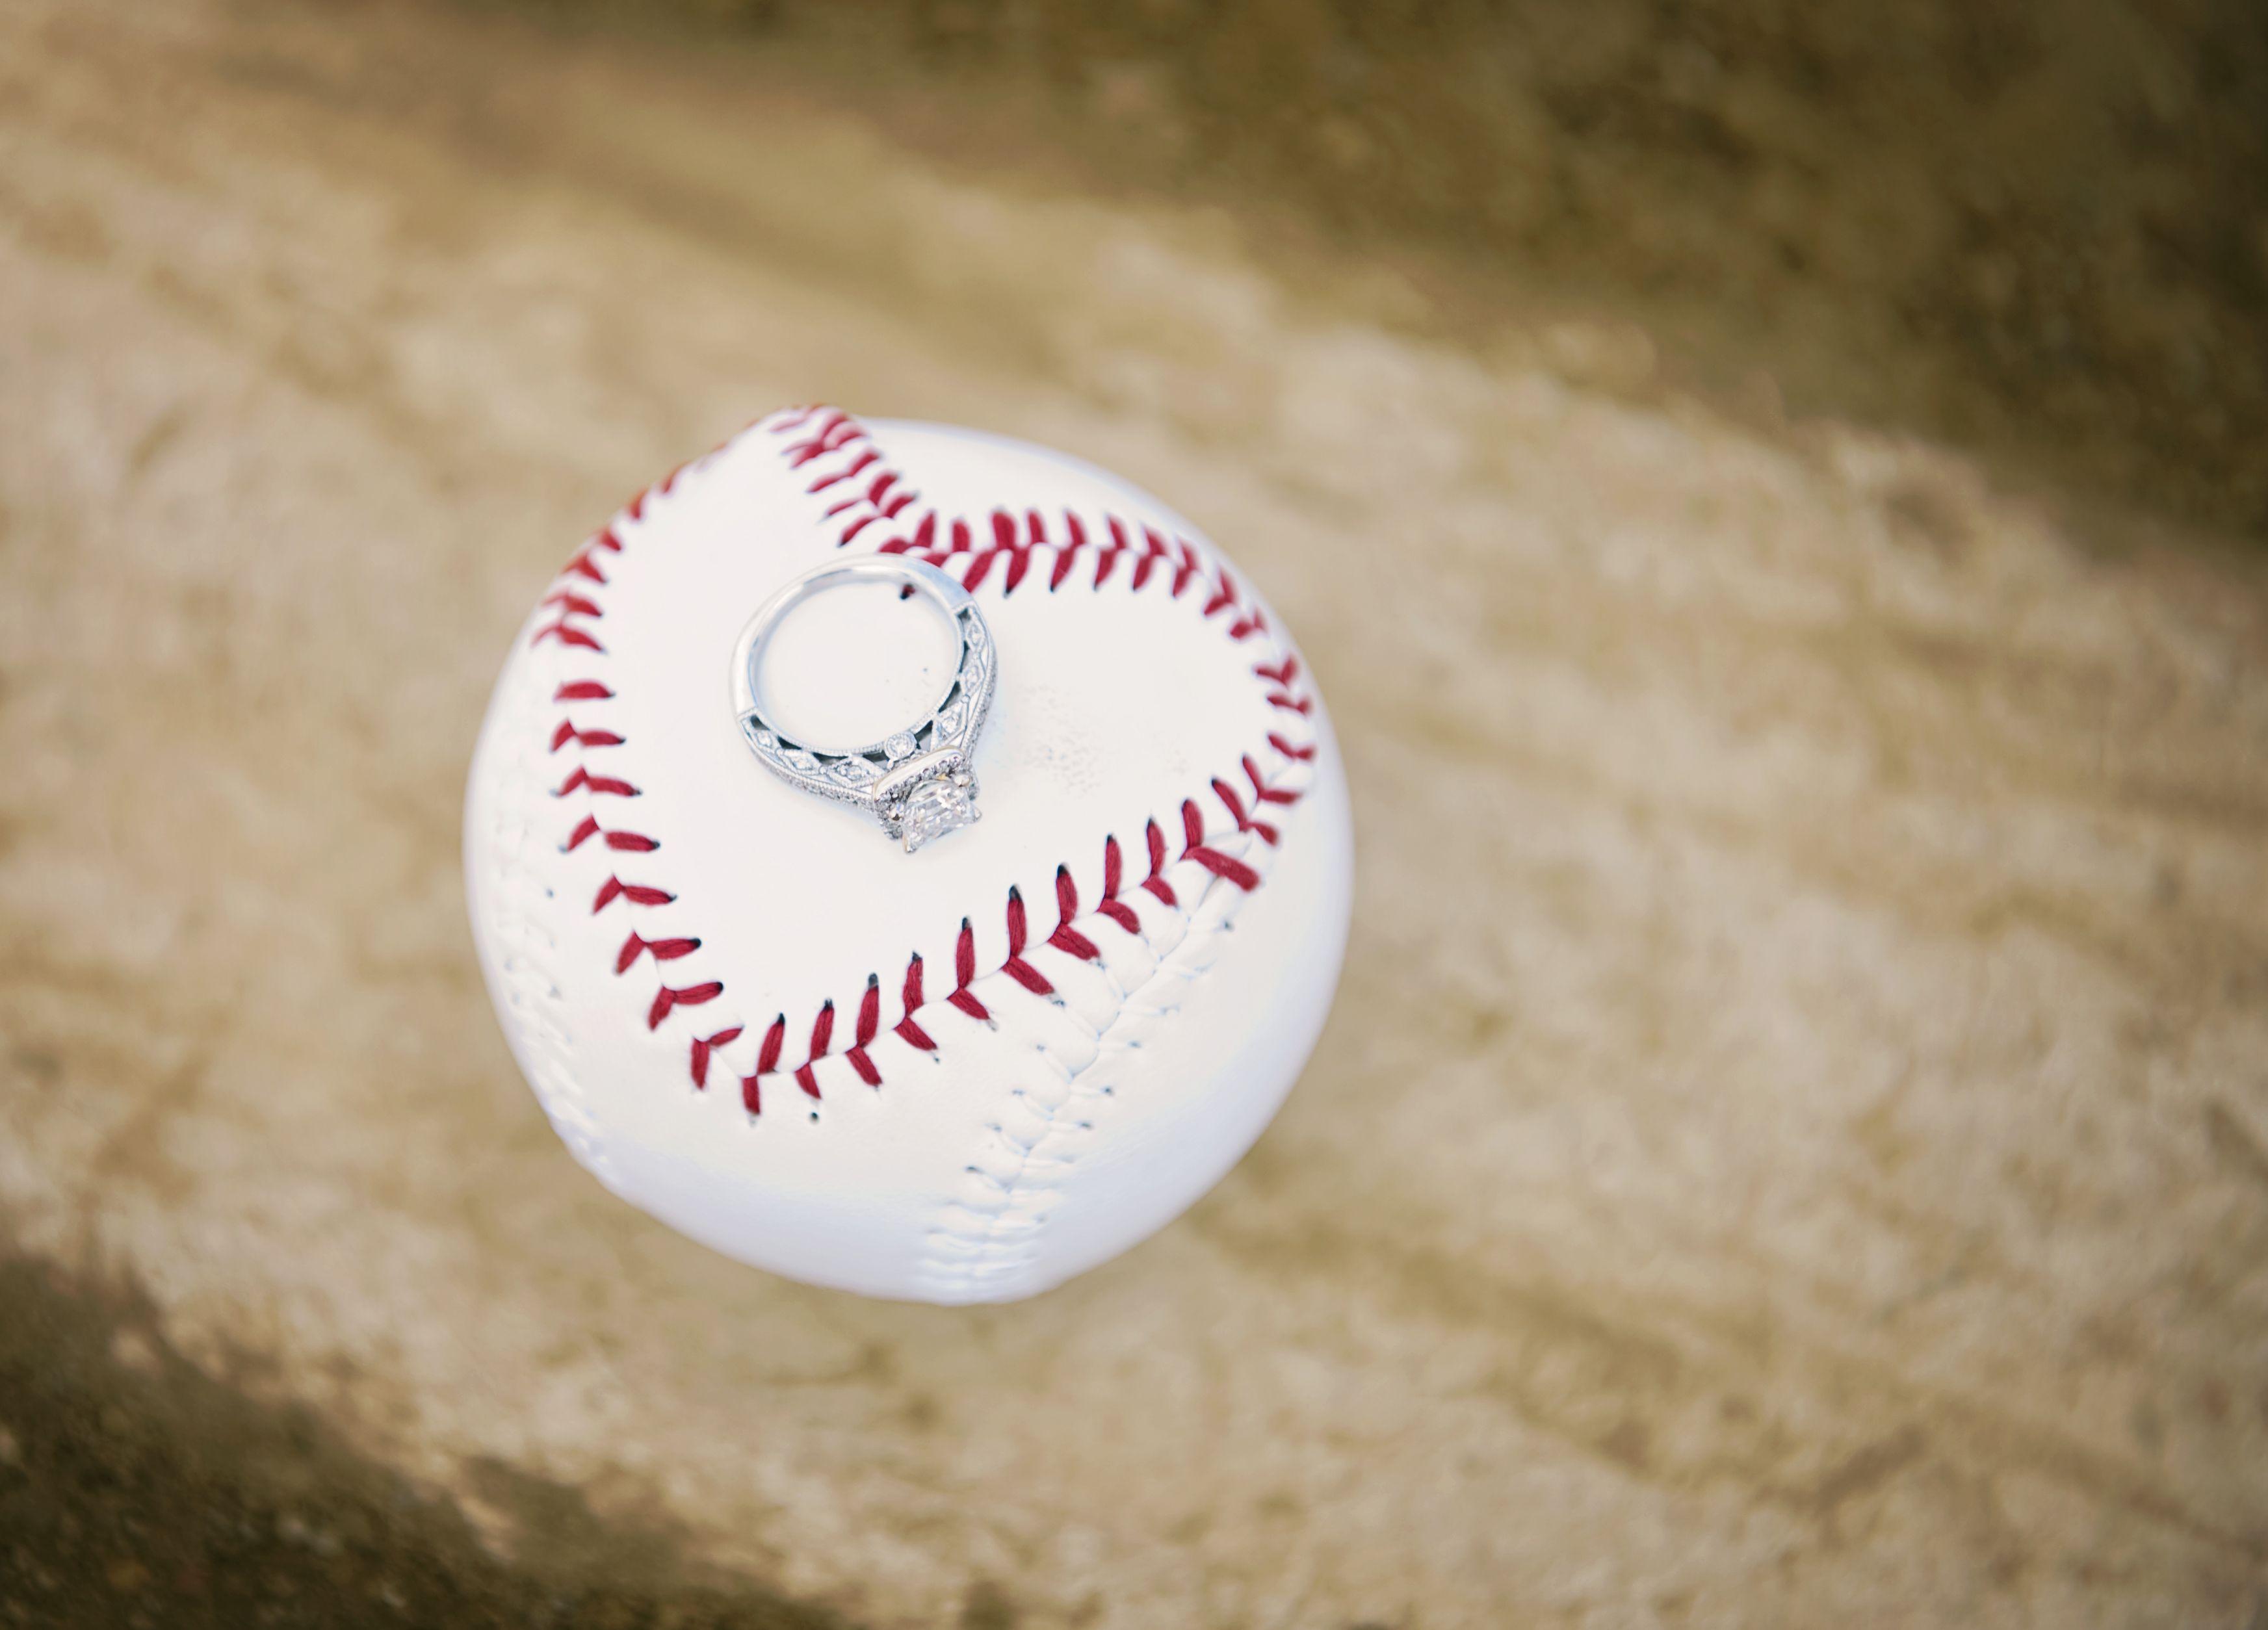 Engagement Ring On Baseball Wedding Engagement Pinterest